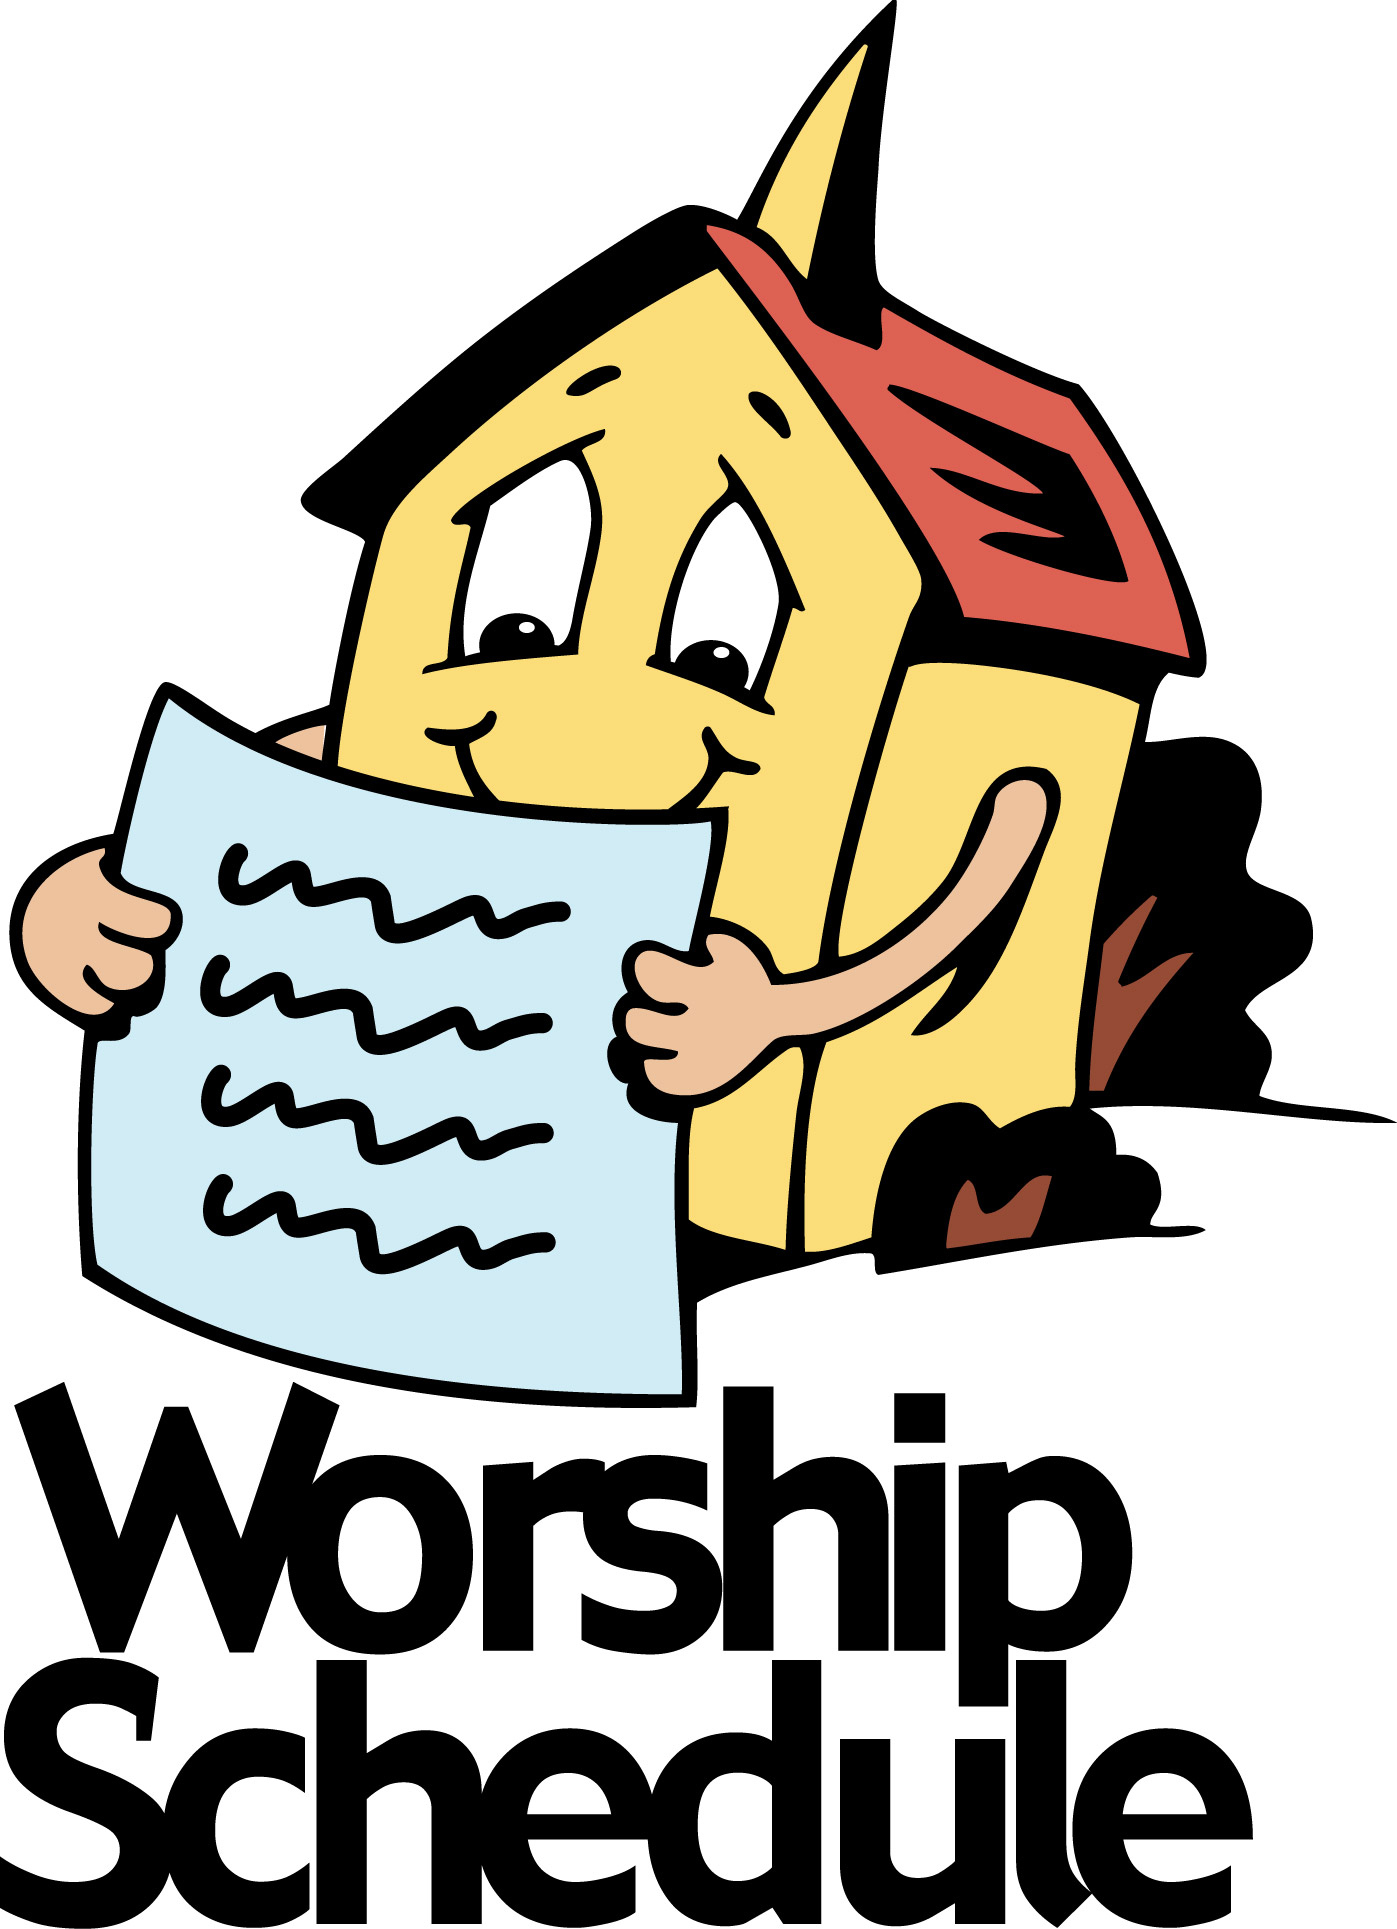 Intercessory Prayer Clipart | Free download best